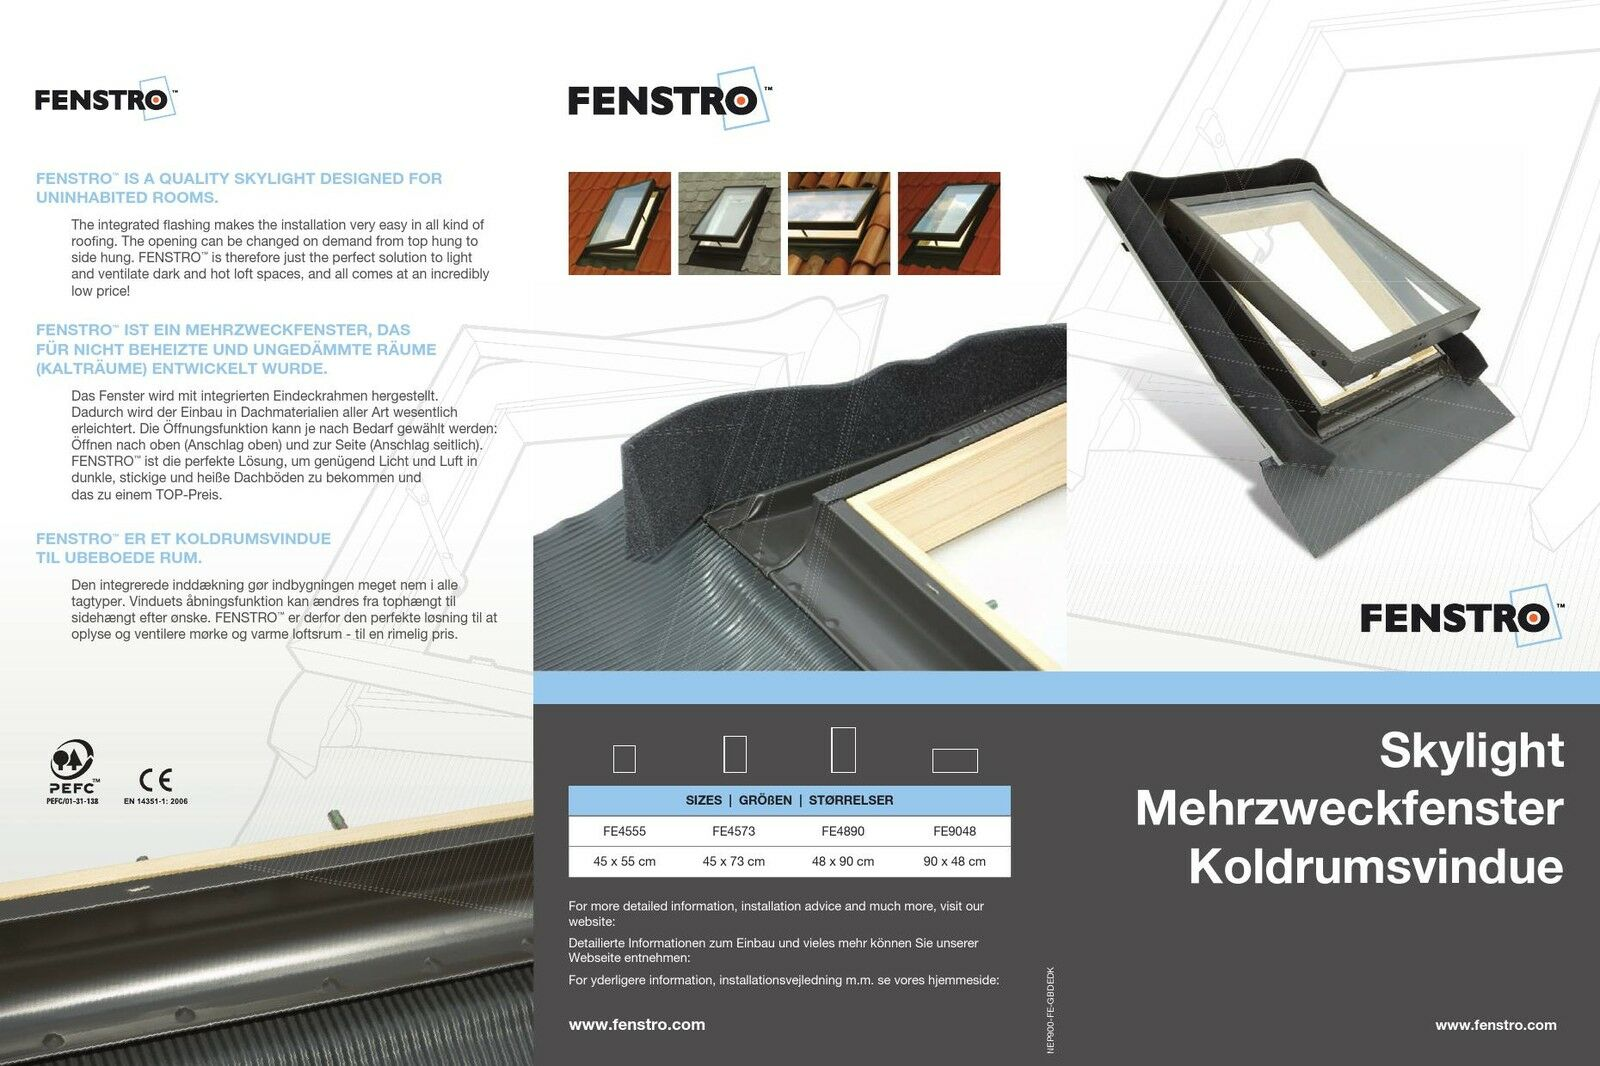 Fenstro Rooflite Double Glazed Skylight Access Roof Window